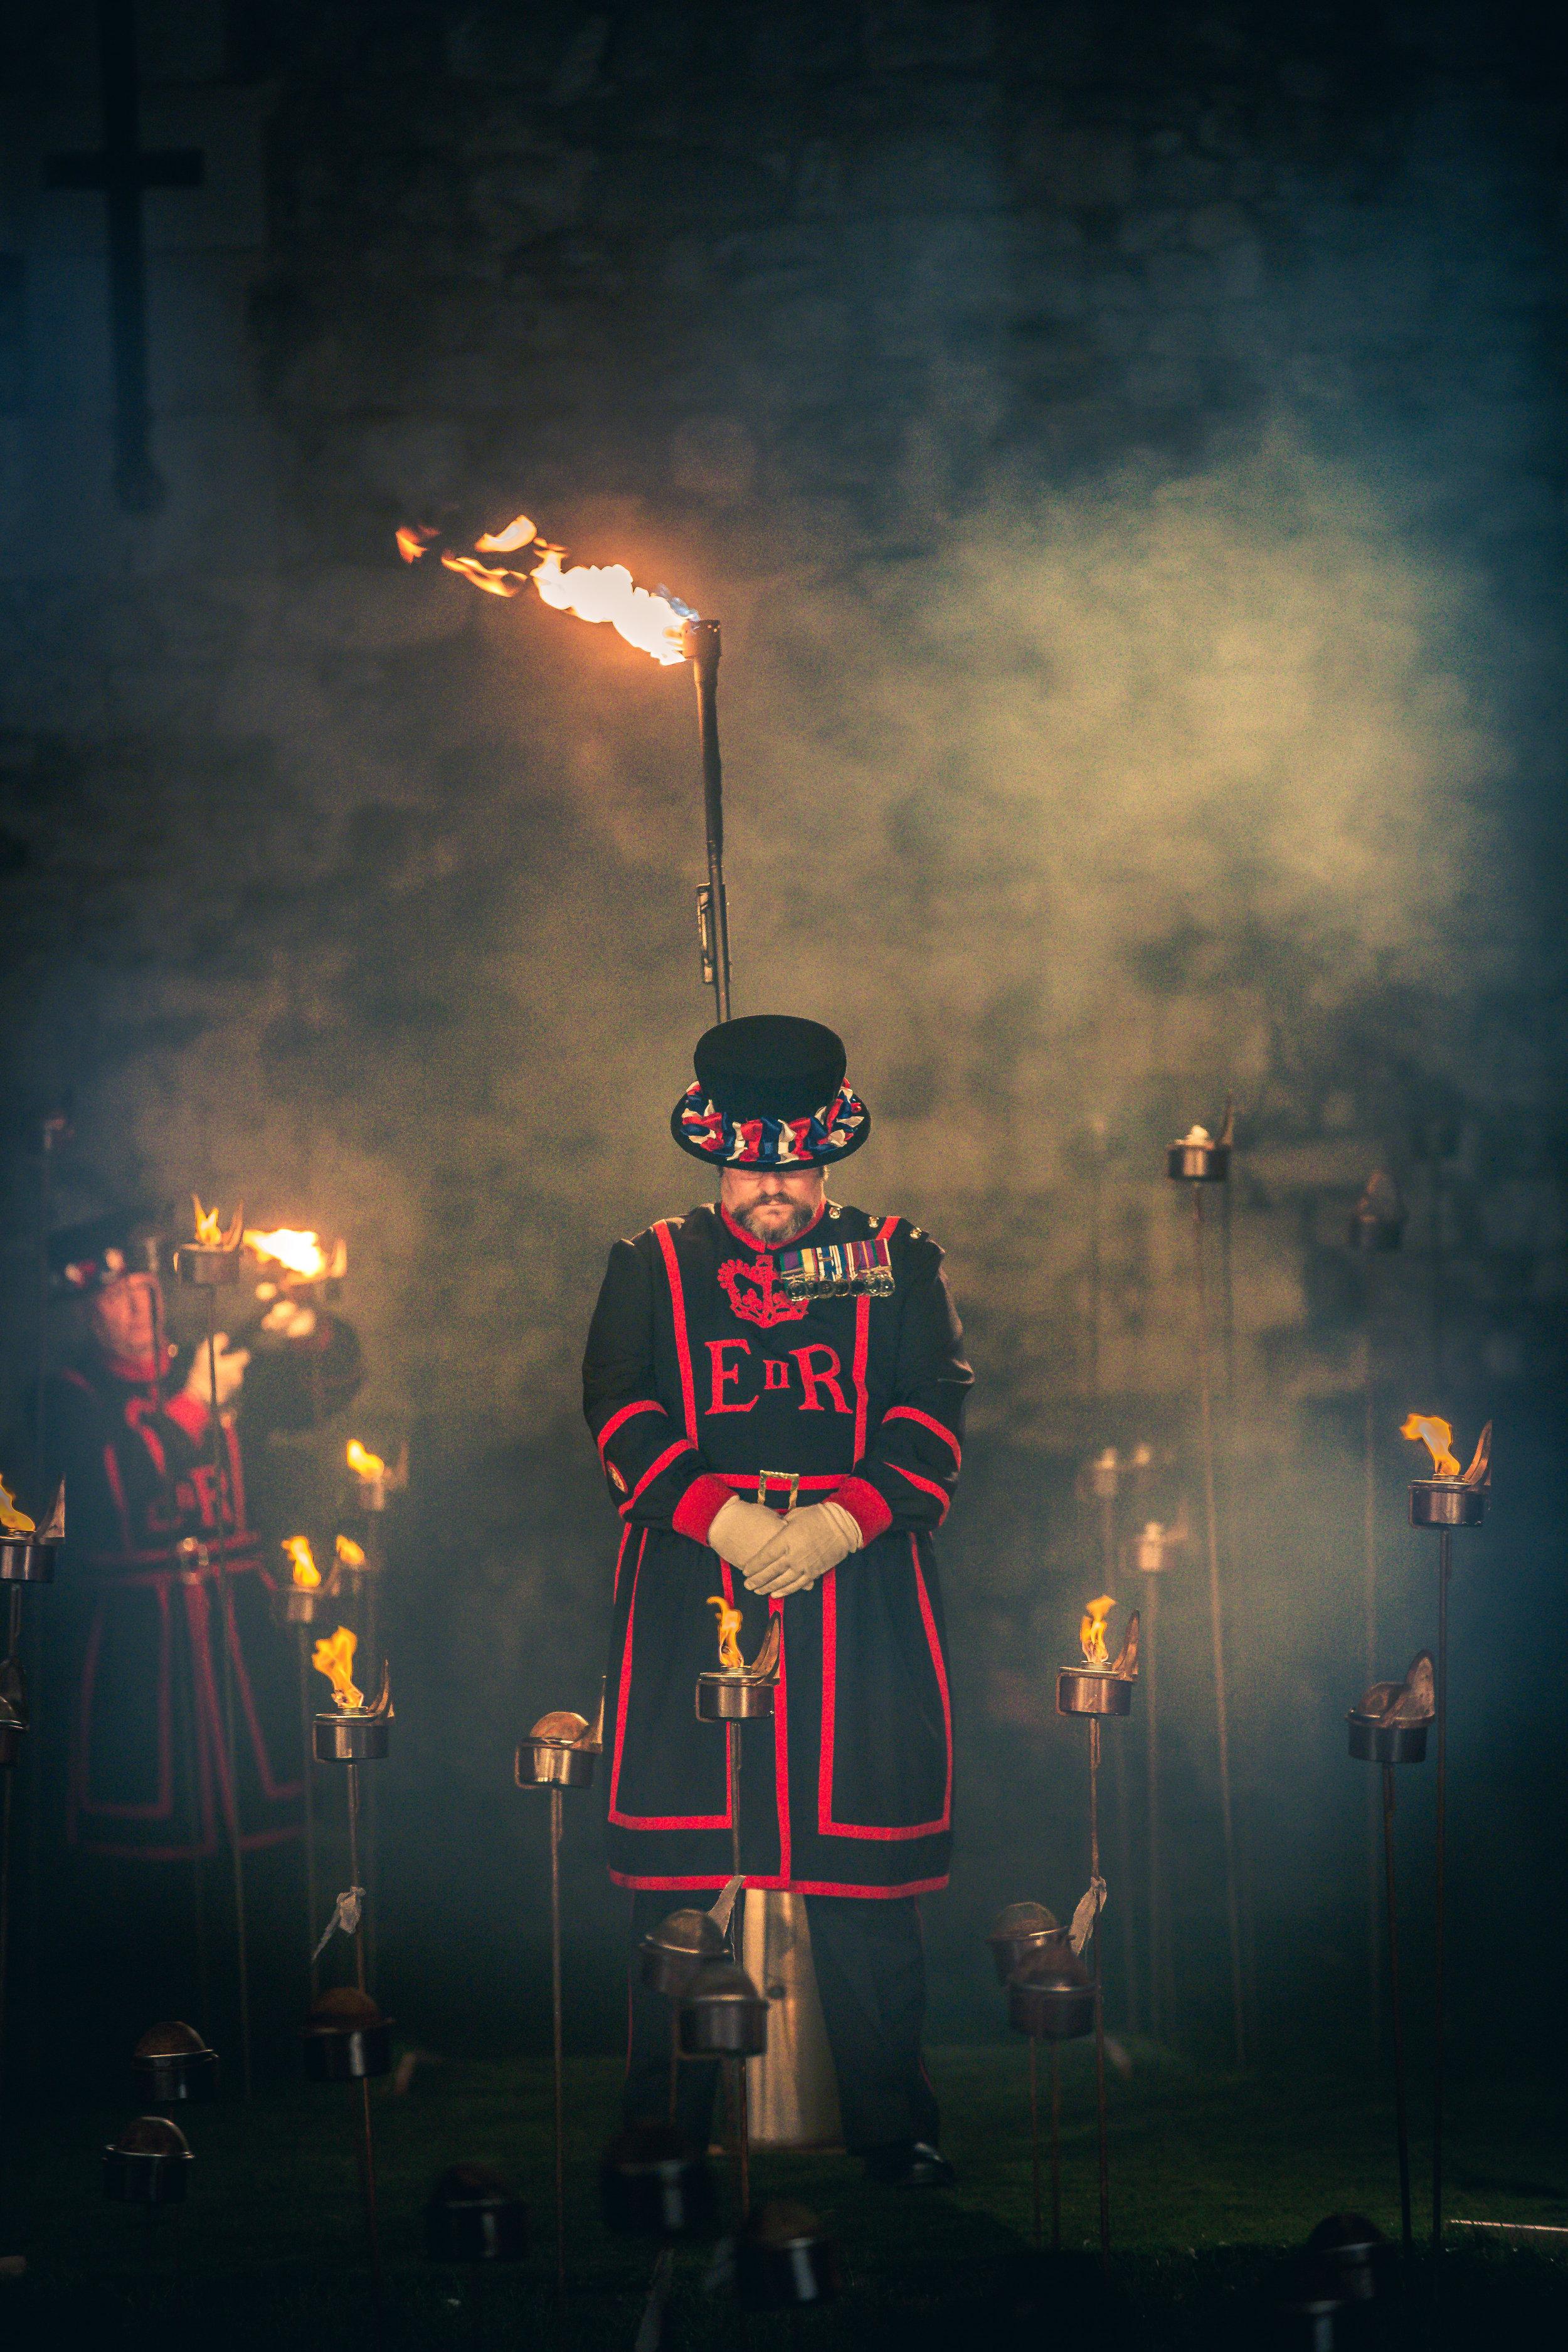 Tower of London Haze Effect - Photograph by Richard Lea-Hair © Historic Royal Palaces